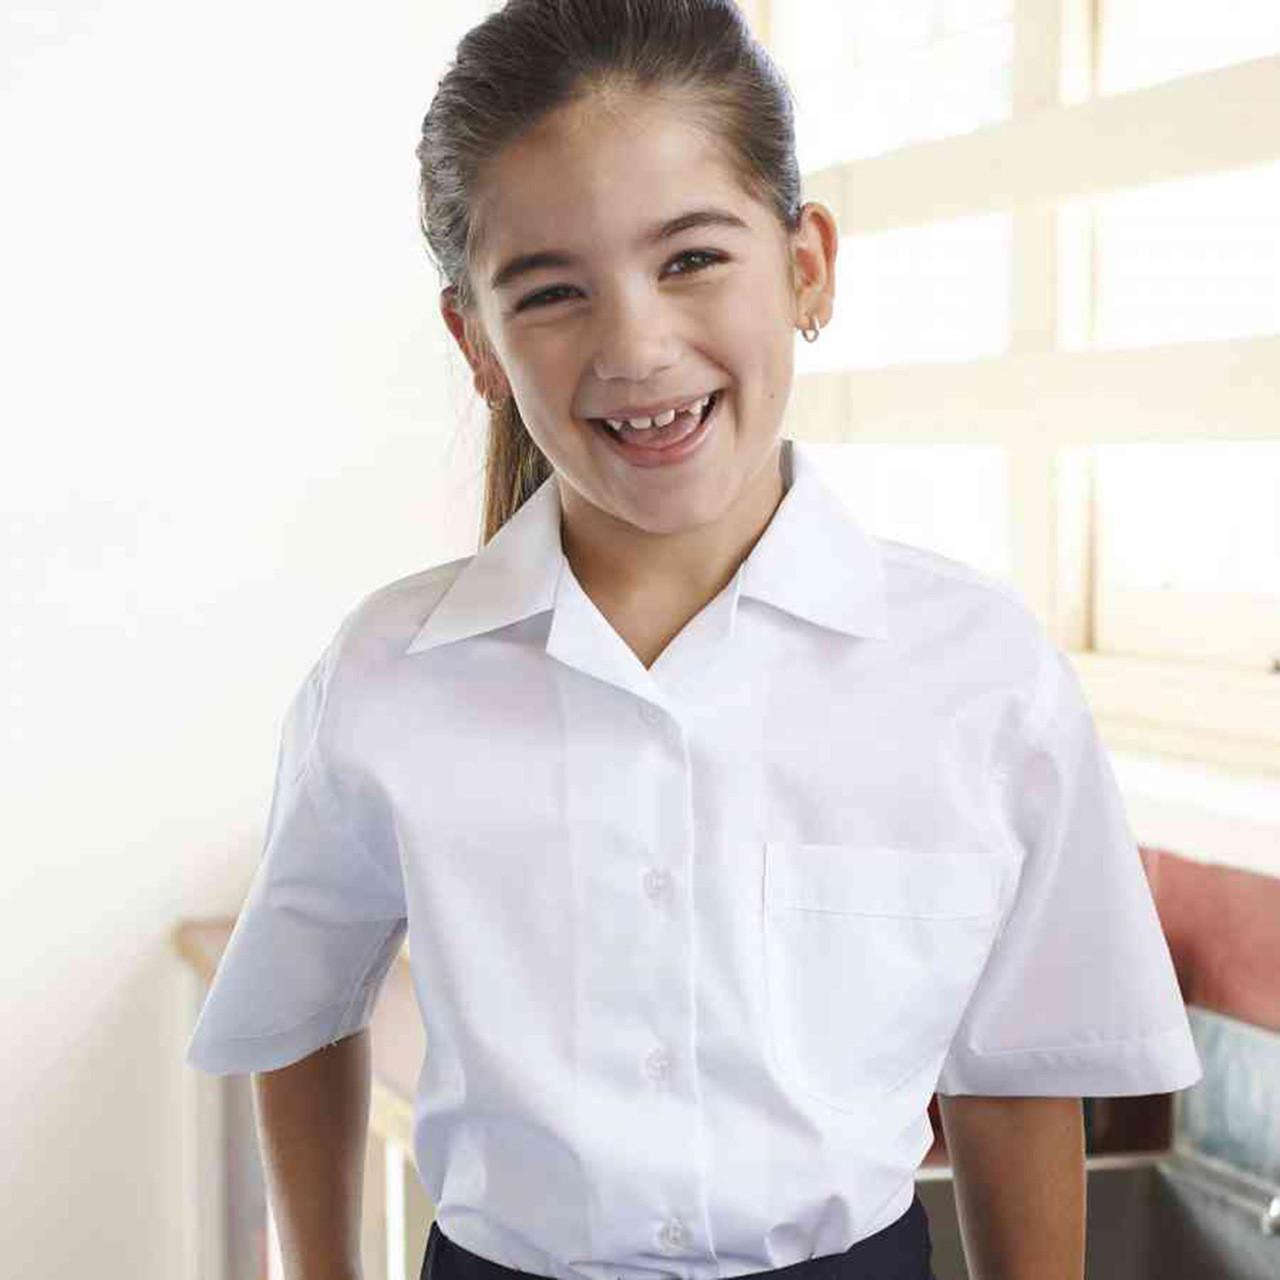 New School Uniform Girls Full Length Plain Tights 12 Pack